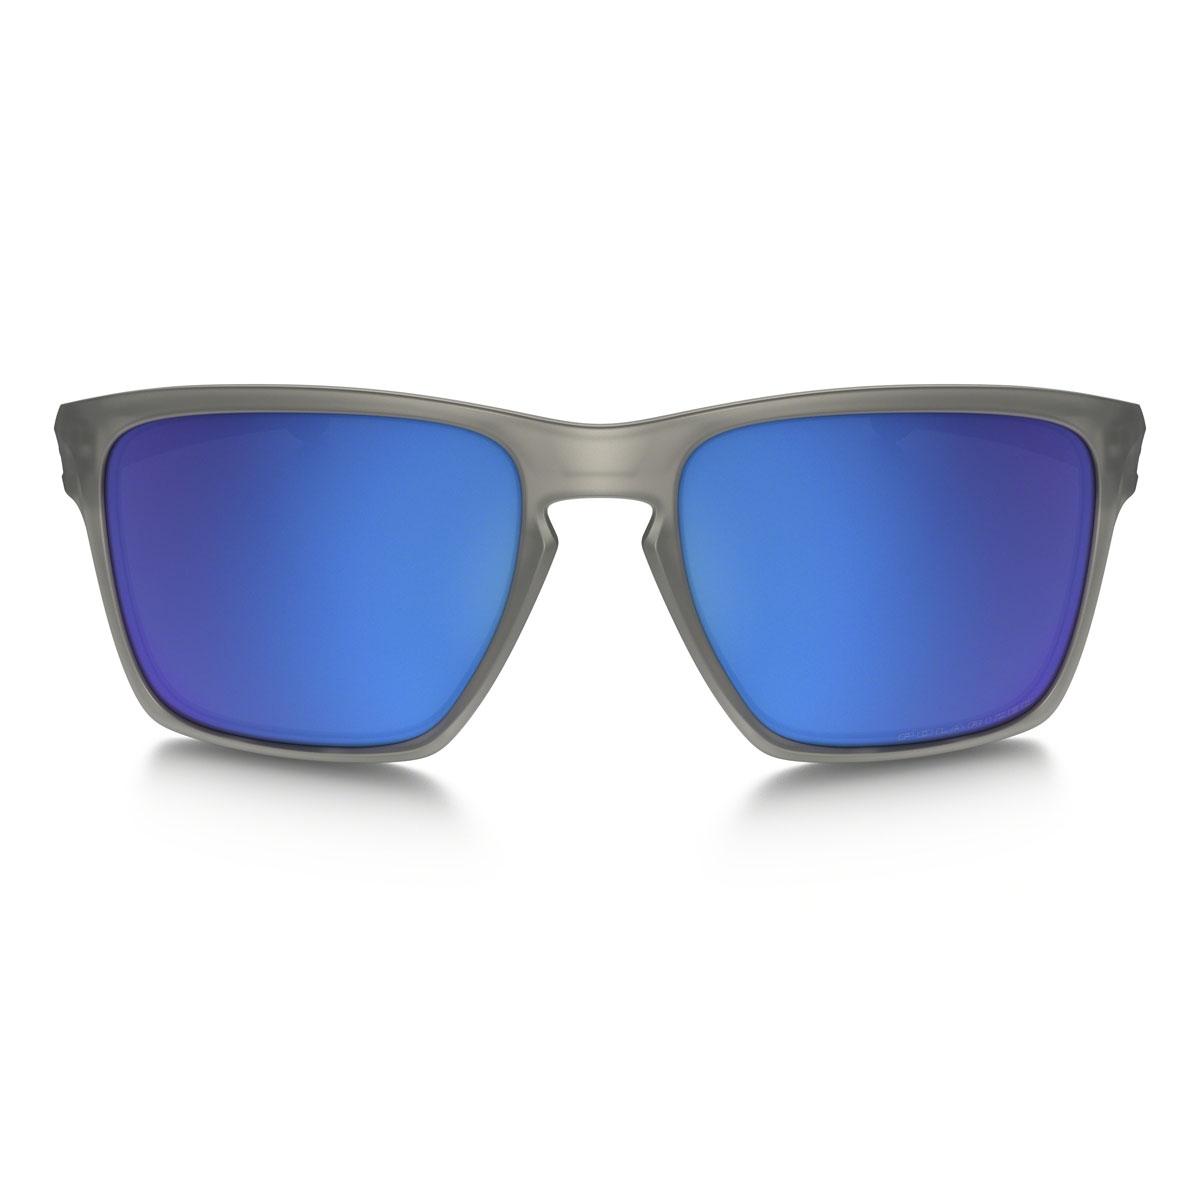 5d335d02ffe ... Image of Oakley Sliver XL Polarized Sunglasses - Matte Grey Frame    Sapphire Iridium Lens